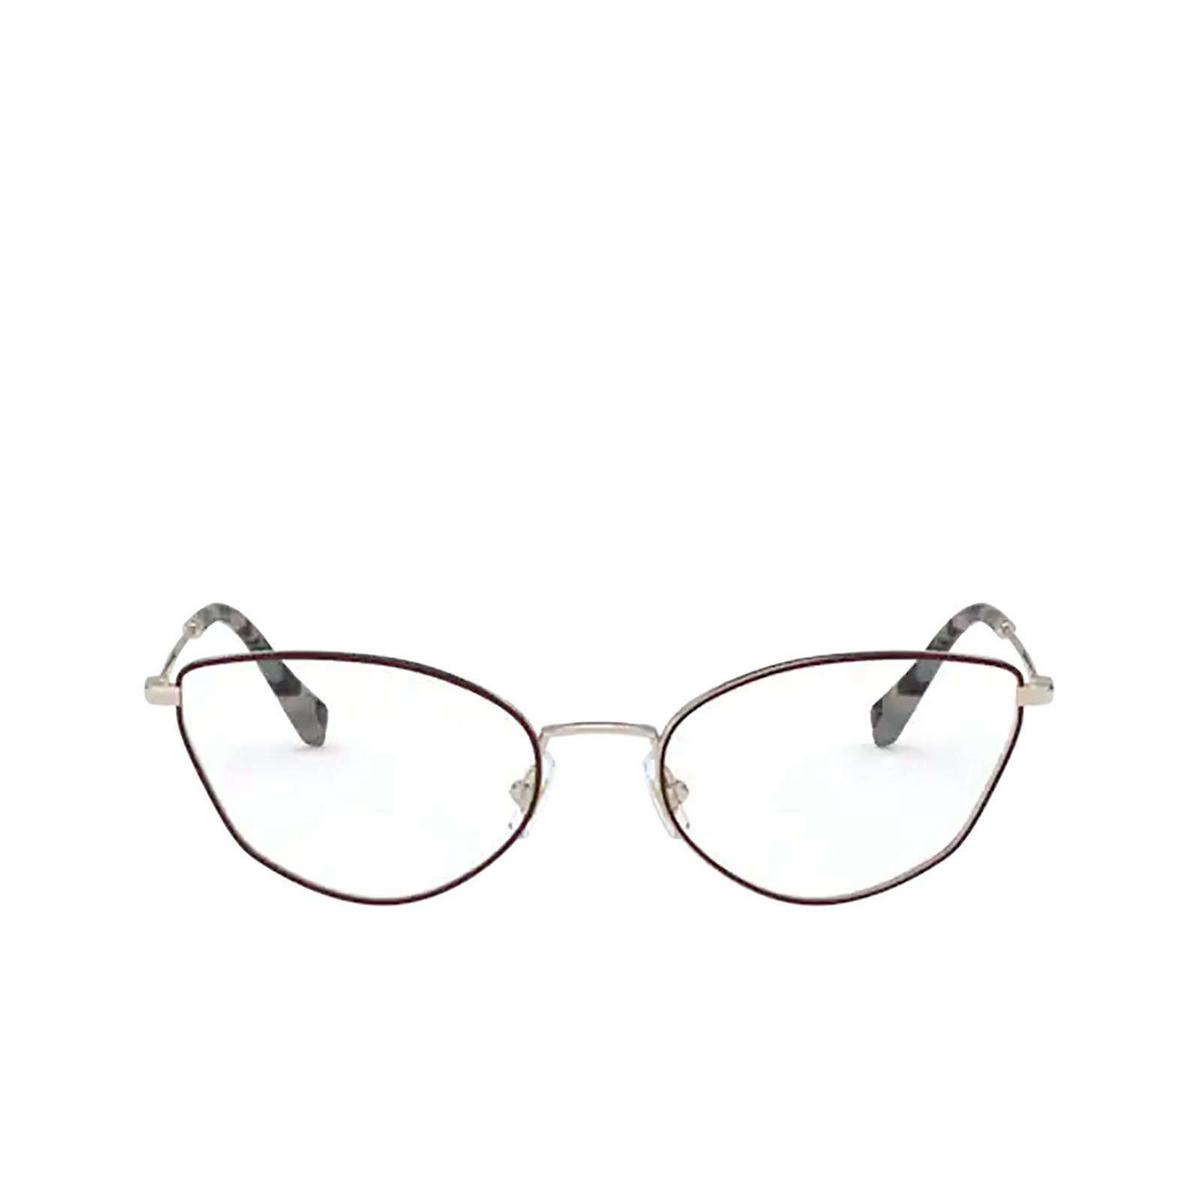 Miu Miu® Cat-eye Eyeglasses: MU 51SV color Pale Gold / Bordeaux 09B1O1 - front view.